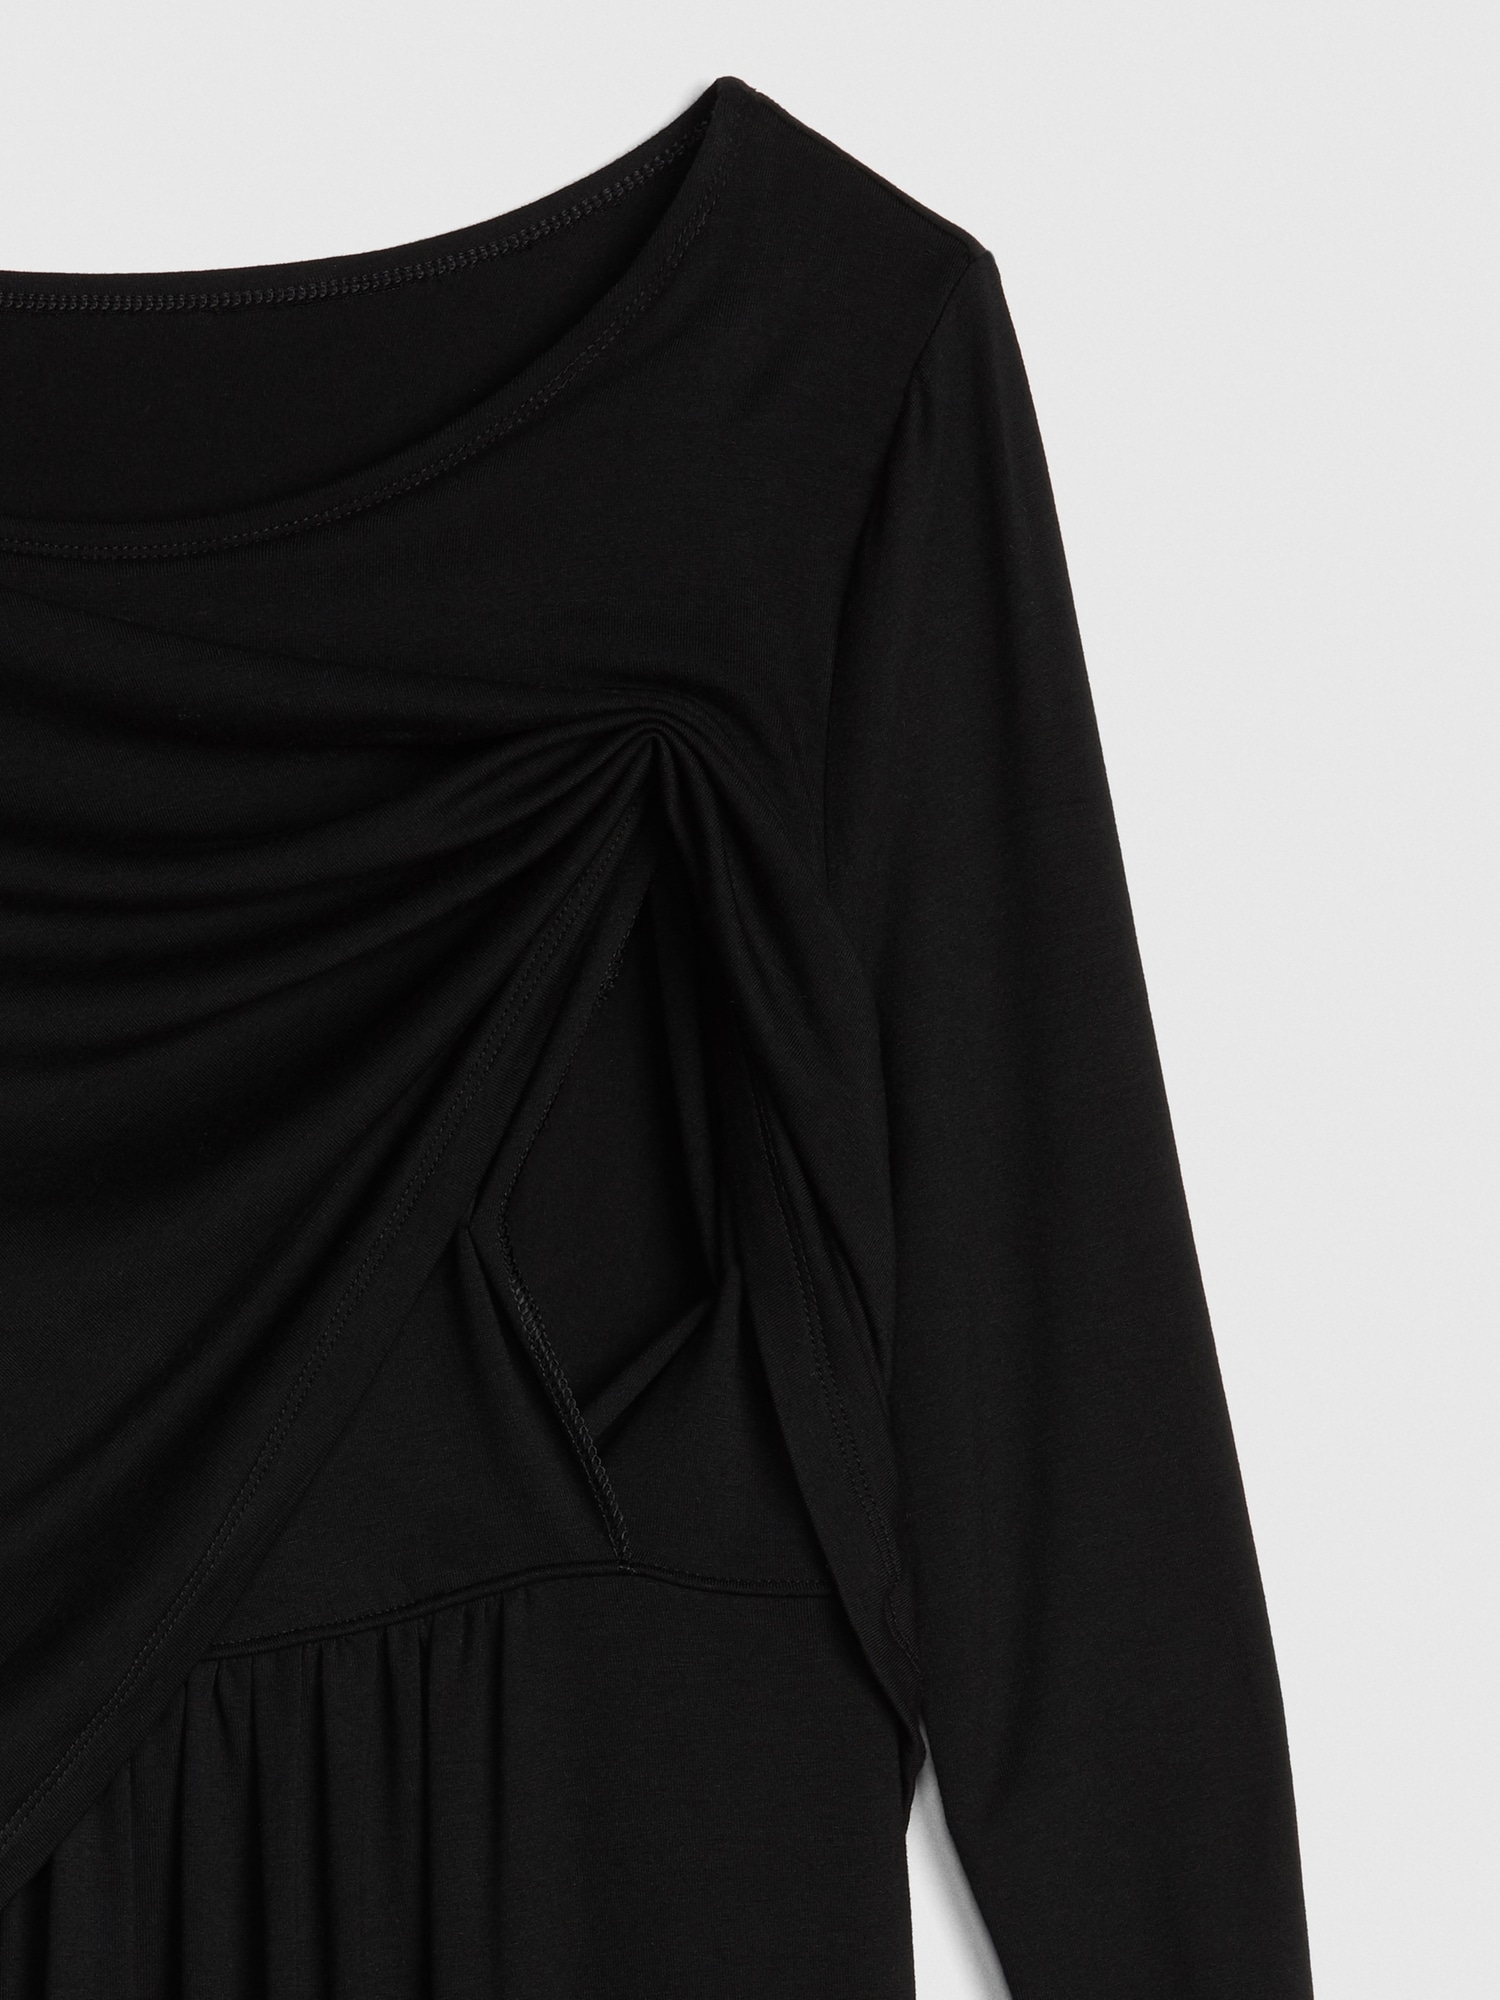 dd21d8cdaa9 Maternity Long Sleeve Layered Nursing Dress